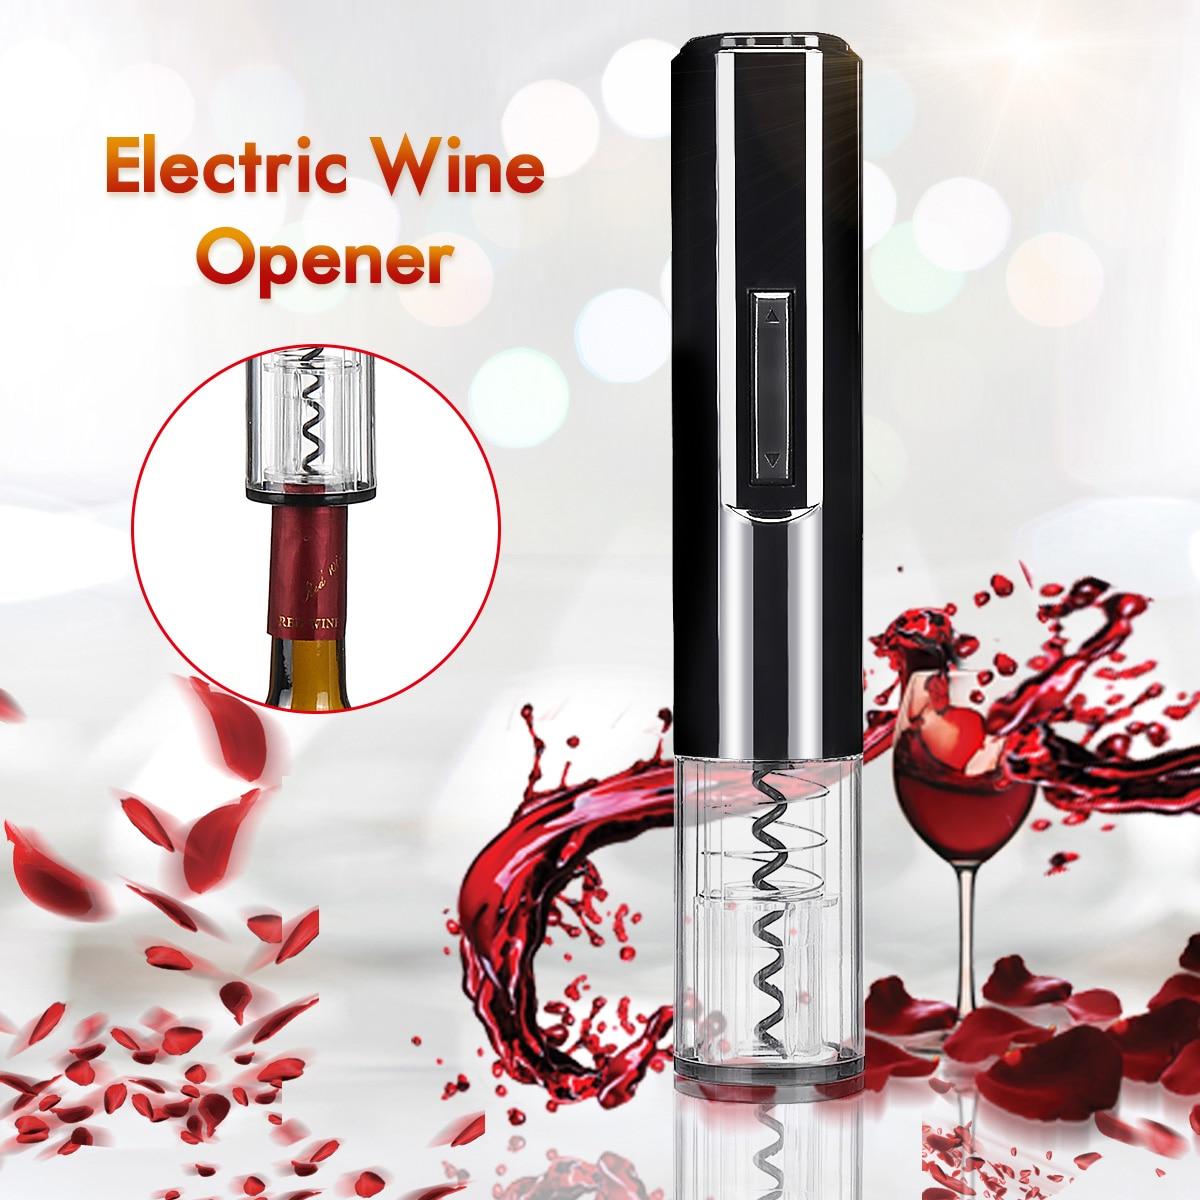 Cork Cutter: Stylish Automatic Electric Bottle Opener Wine Cutter Cork